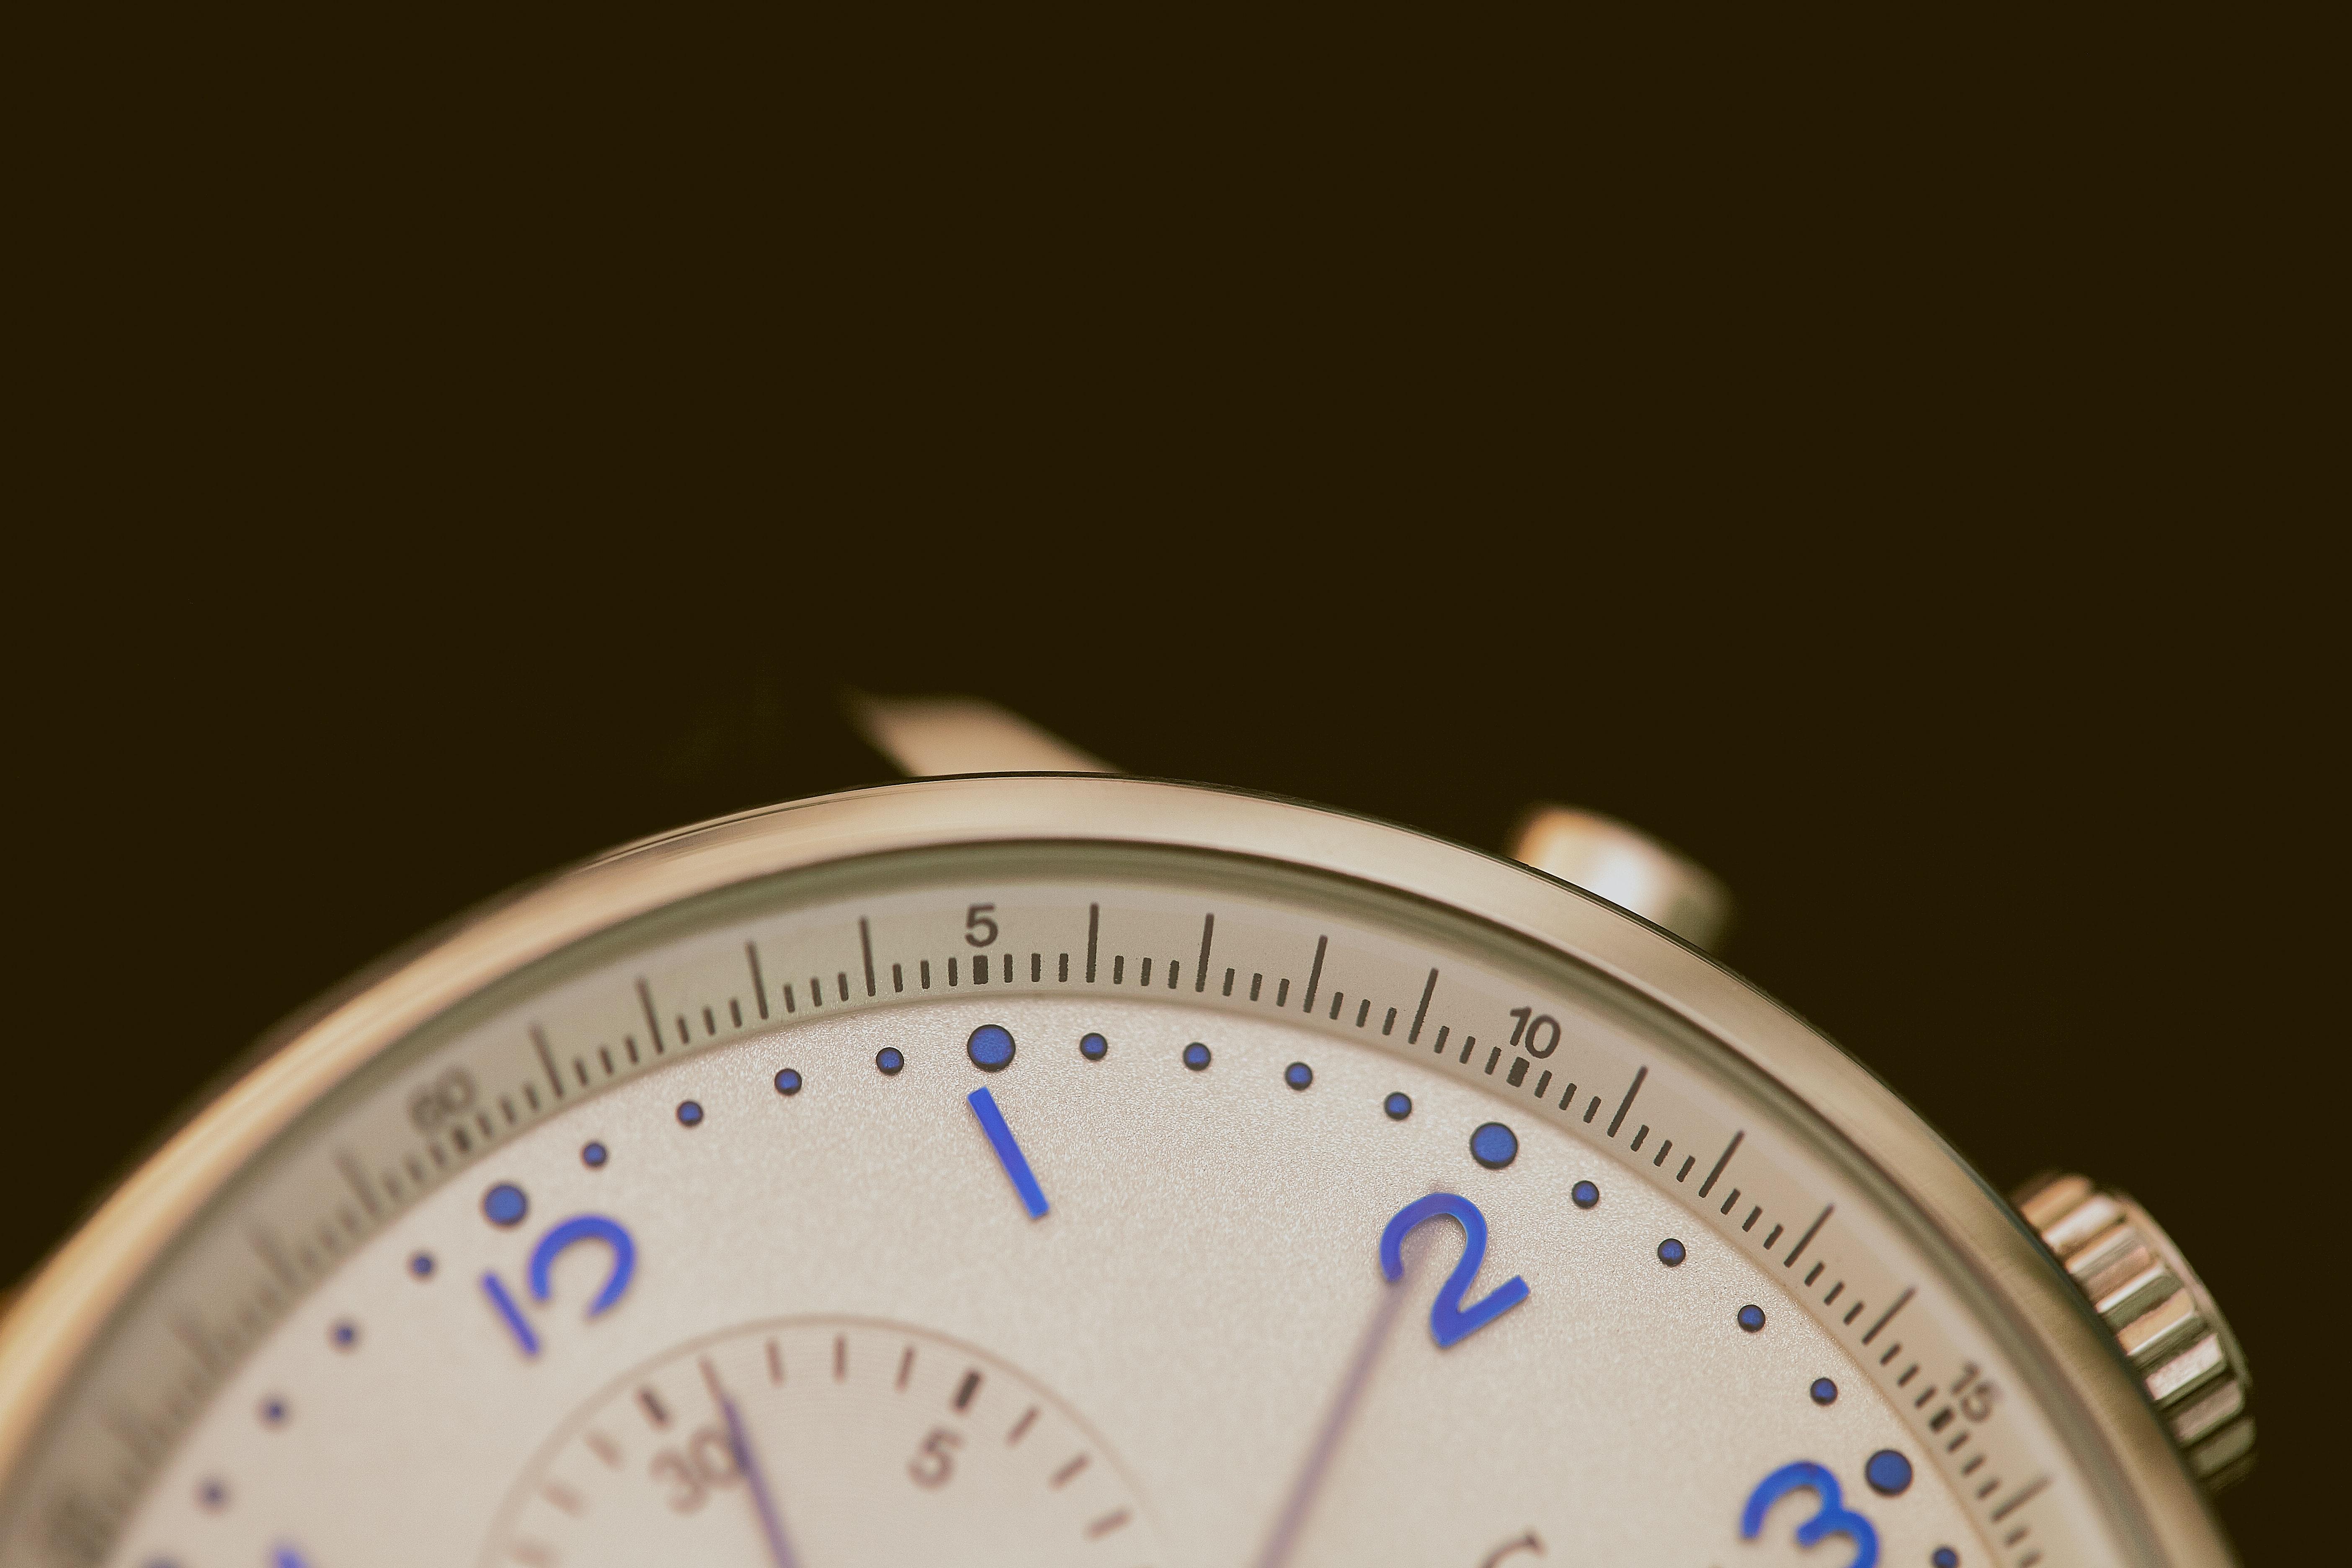 Photo of a close-up image of a watch. Image courtesy of Agê Barros via Unsplash.